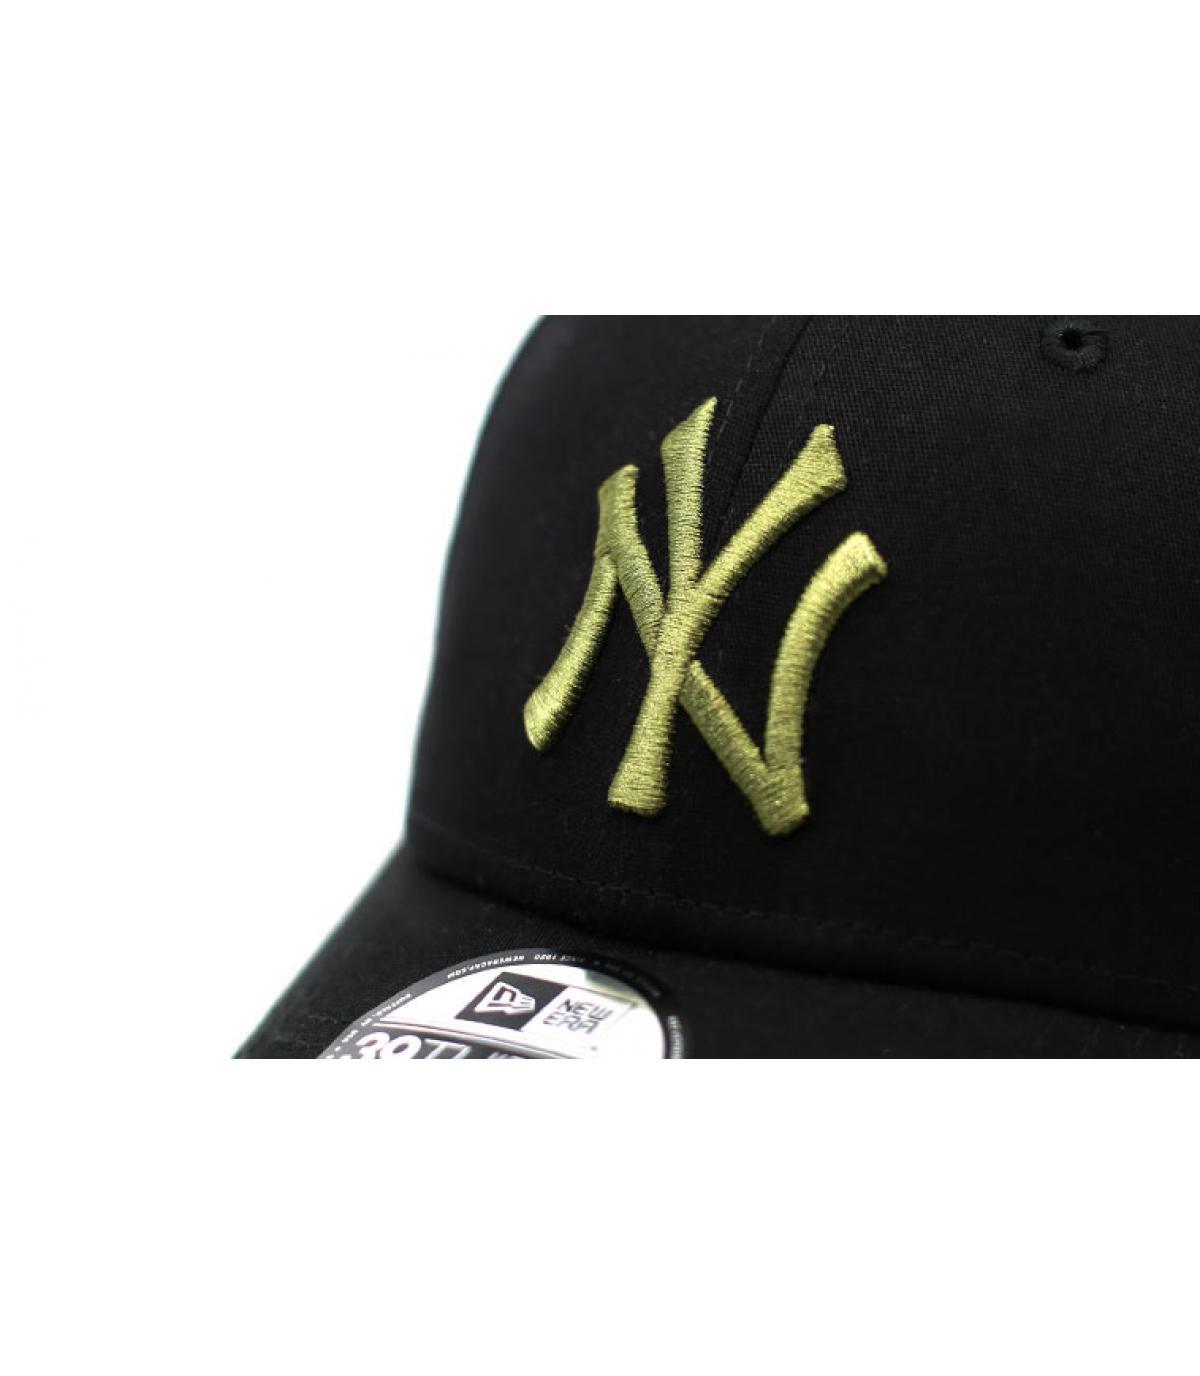 Dettagli League Ess NY 39Thirty black olive - image 3